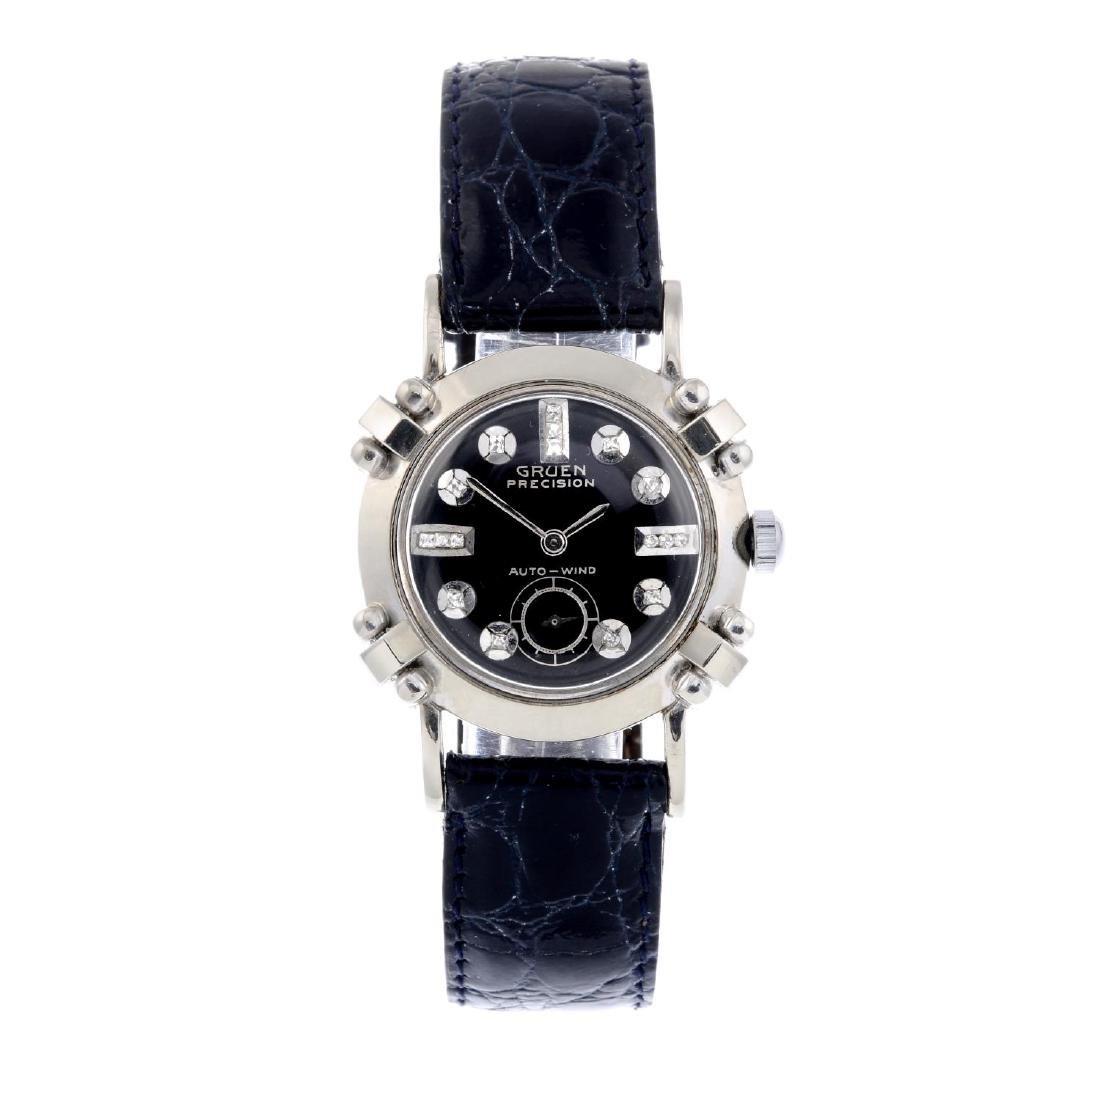 GRUEN - a lady's wrist watch. White metal case stamped